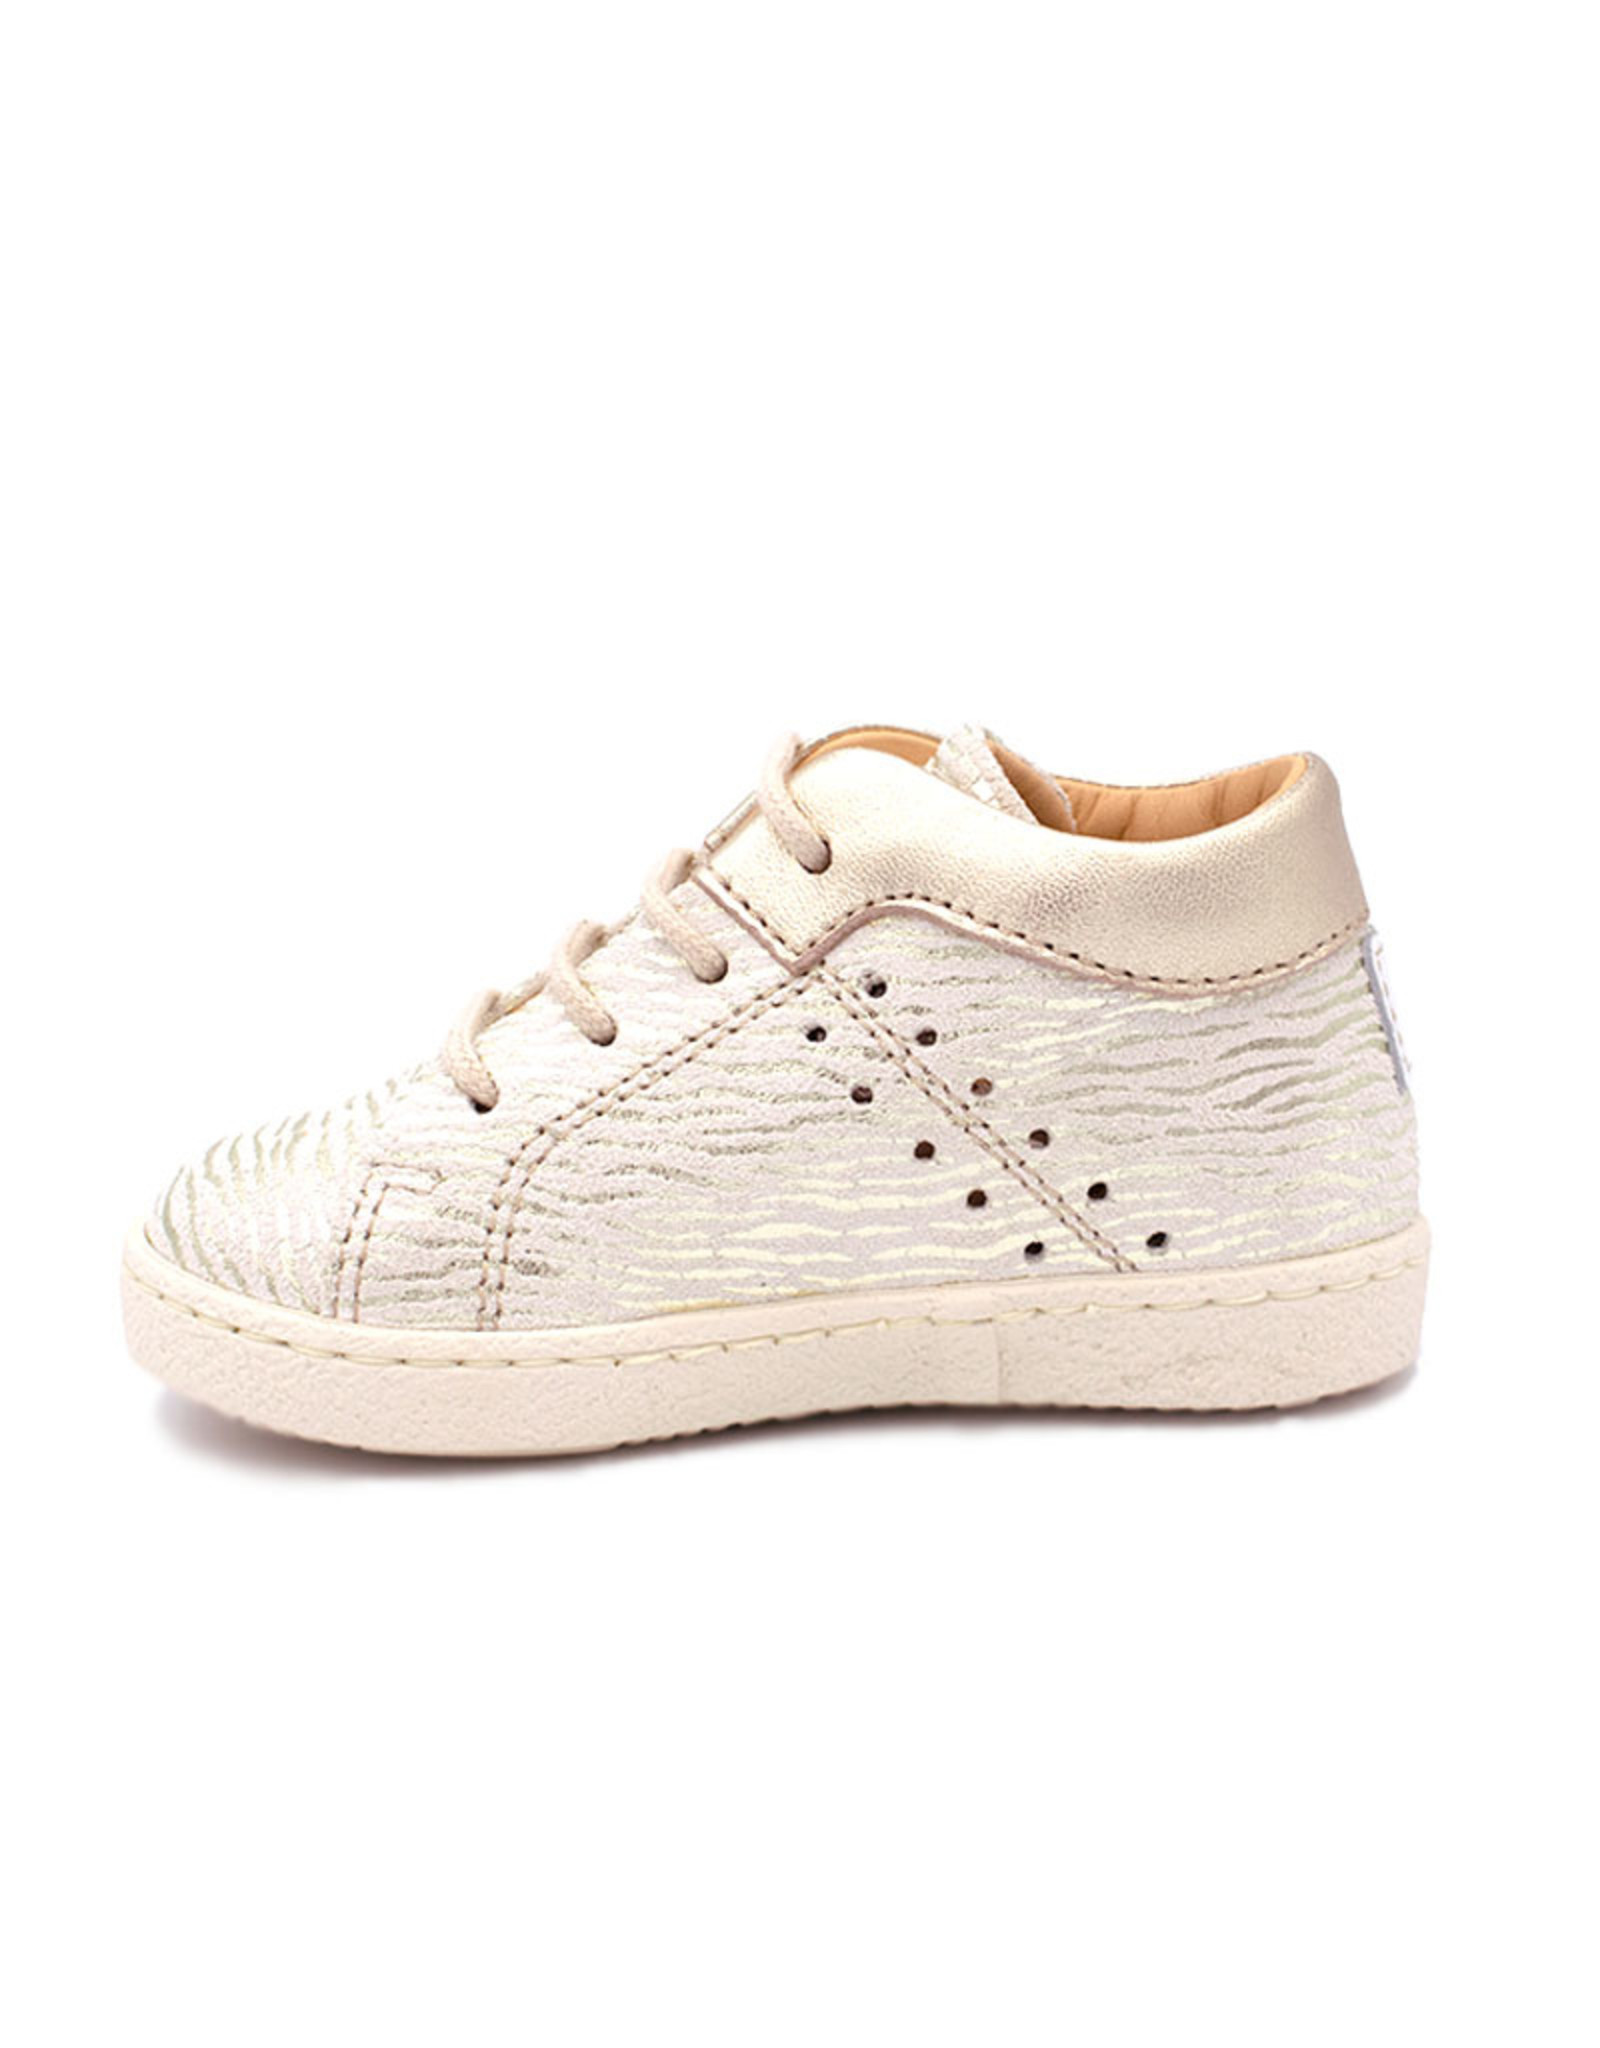 OCRA OCRA sneaker zebra platino